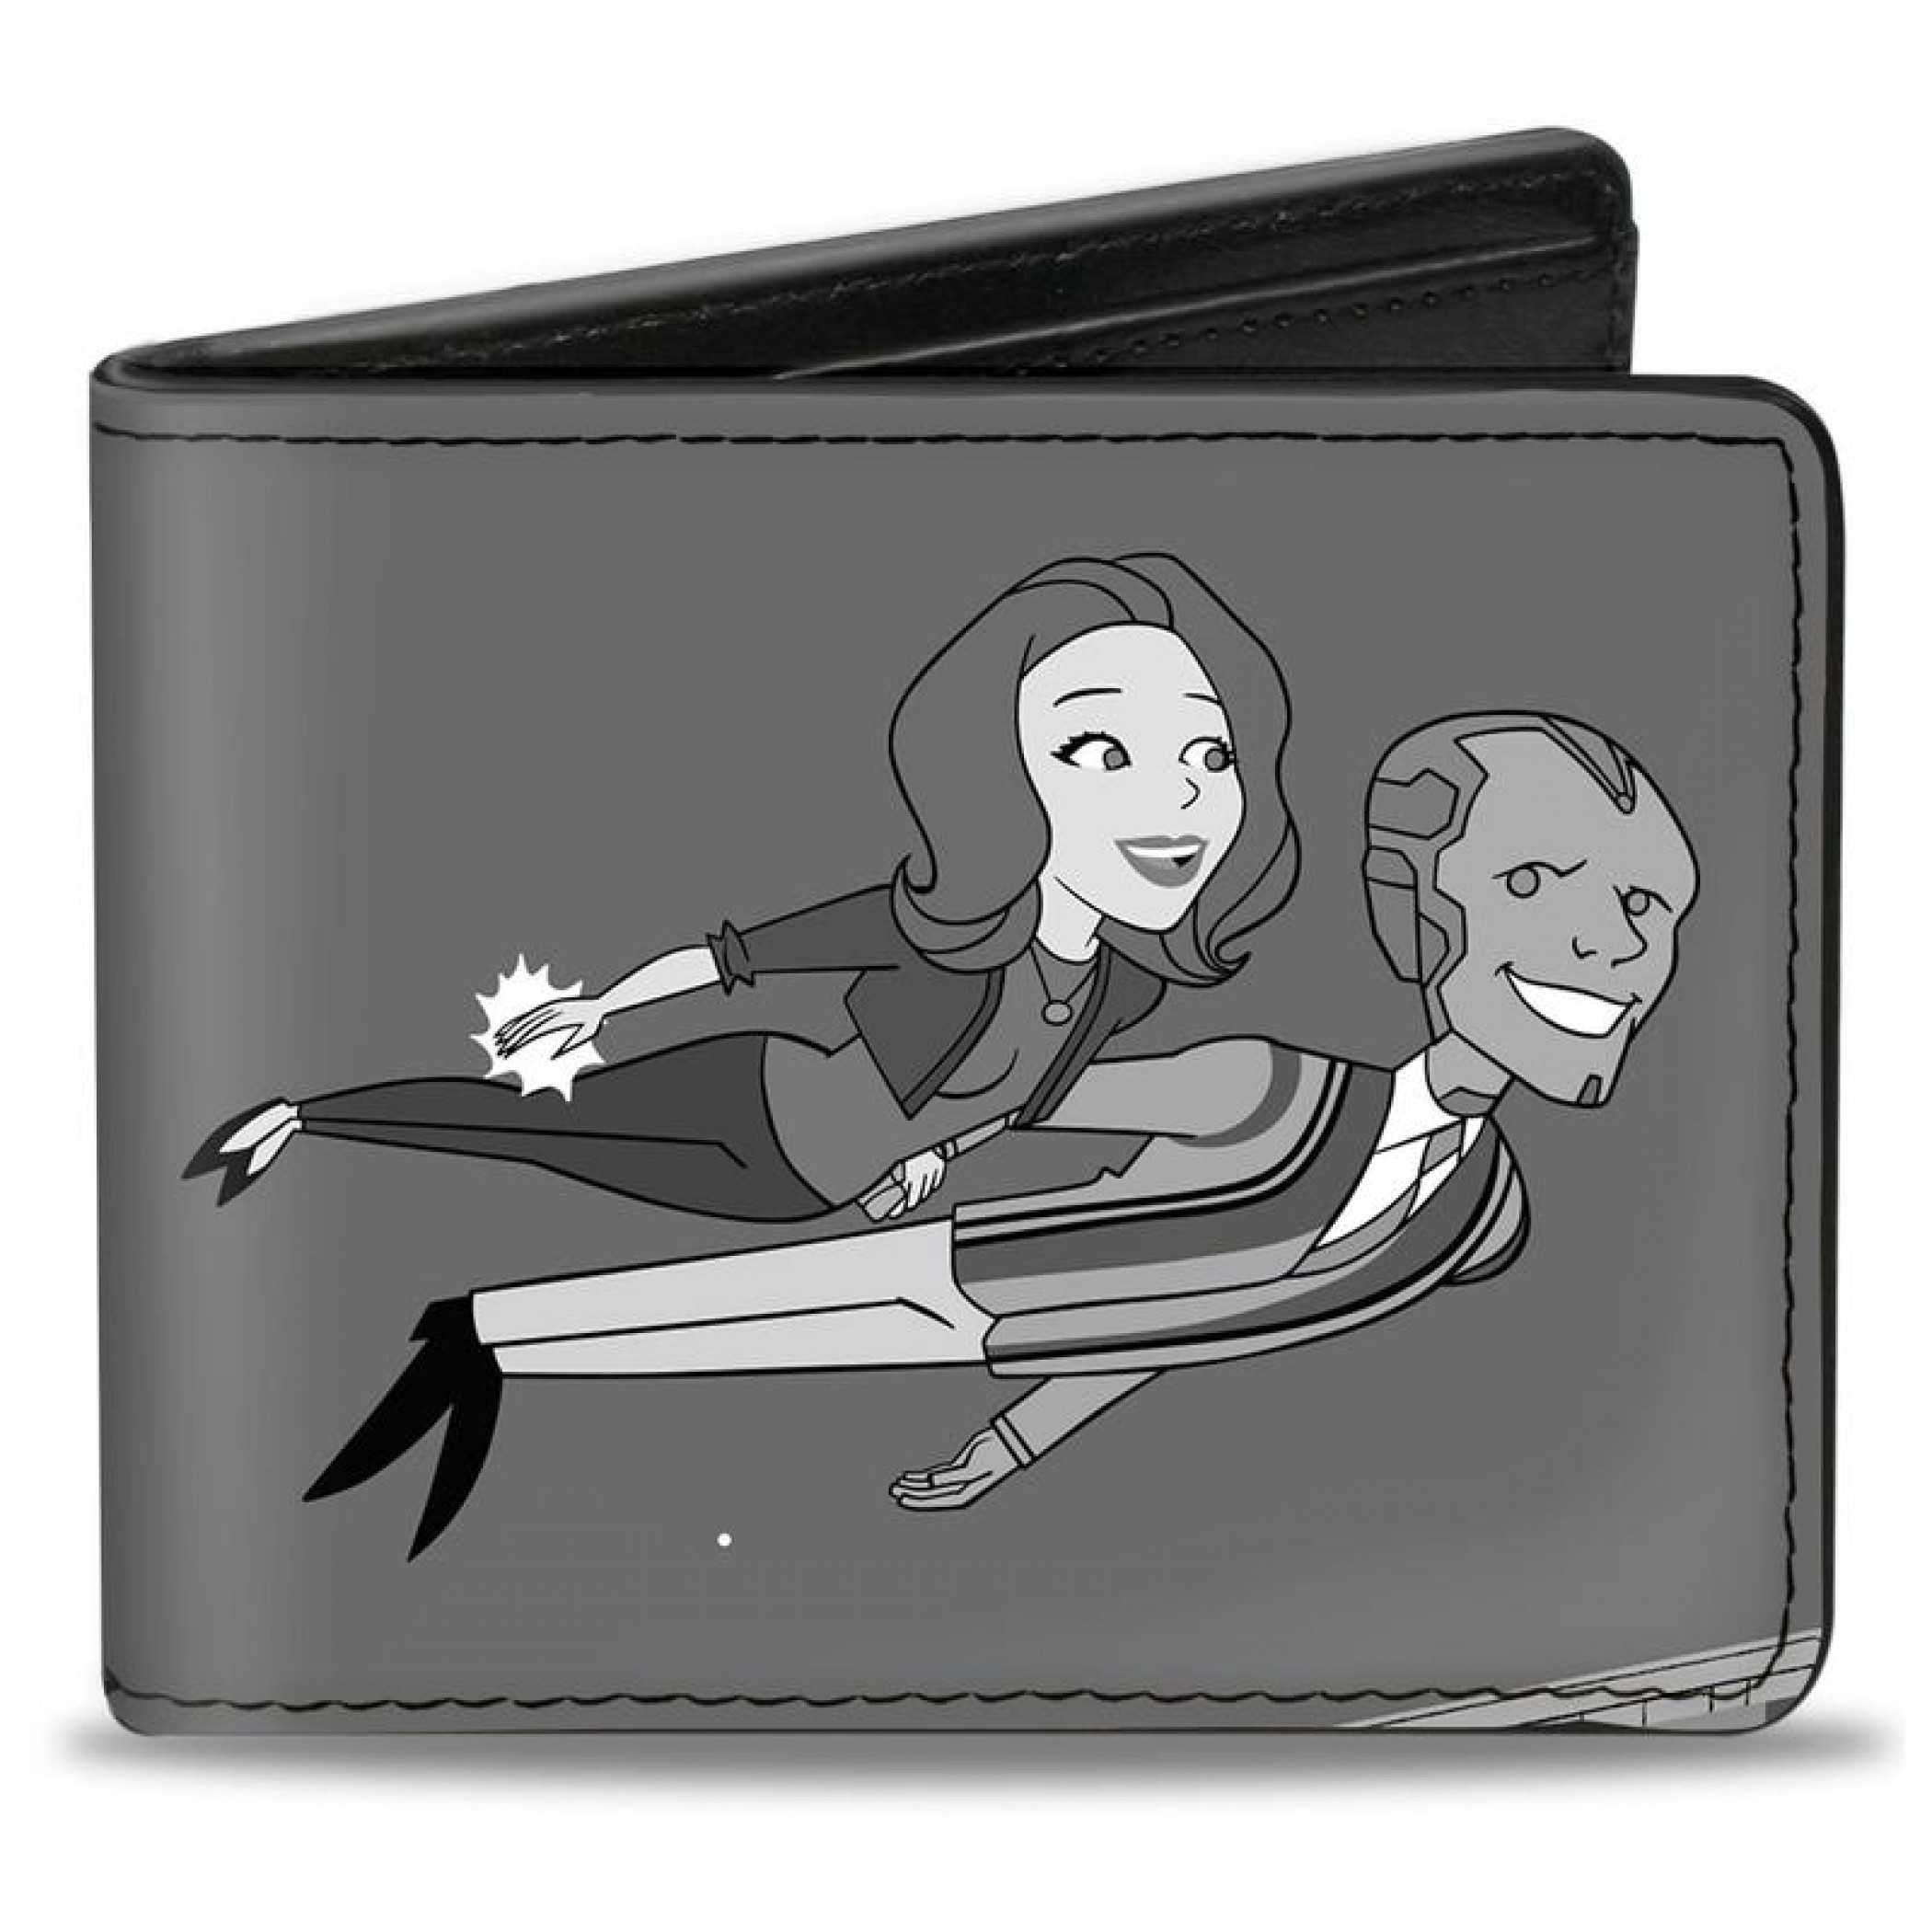 Marvel Studios WandaVision Series Scarlet and Vision Flying Wallet Bi-Fold